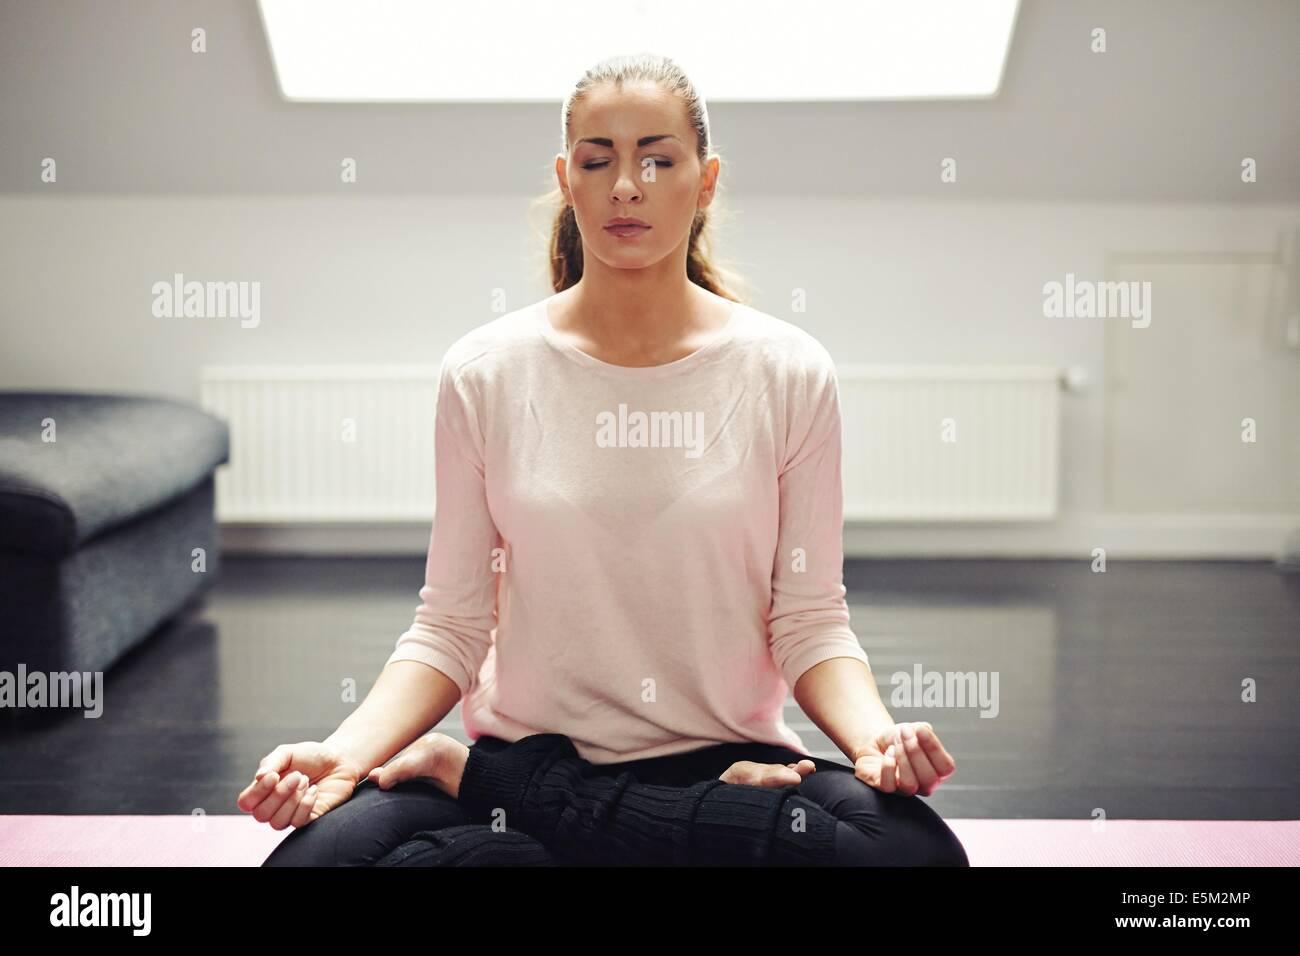 meditation stockfotos meditation bilder alamy. Black Bedroom Furniture Sets. Home Design Ideas